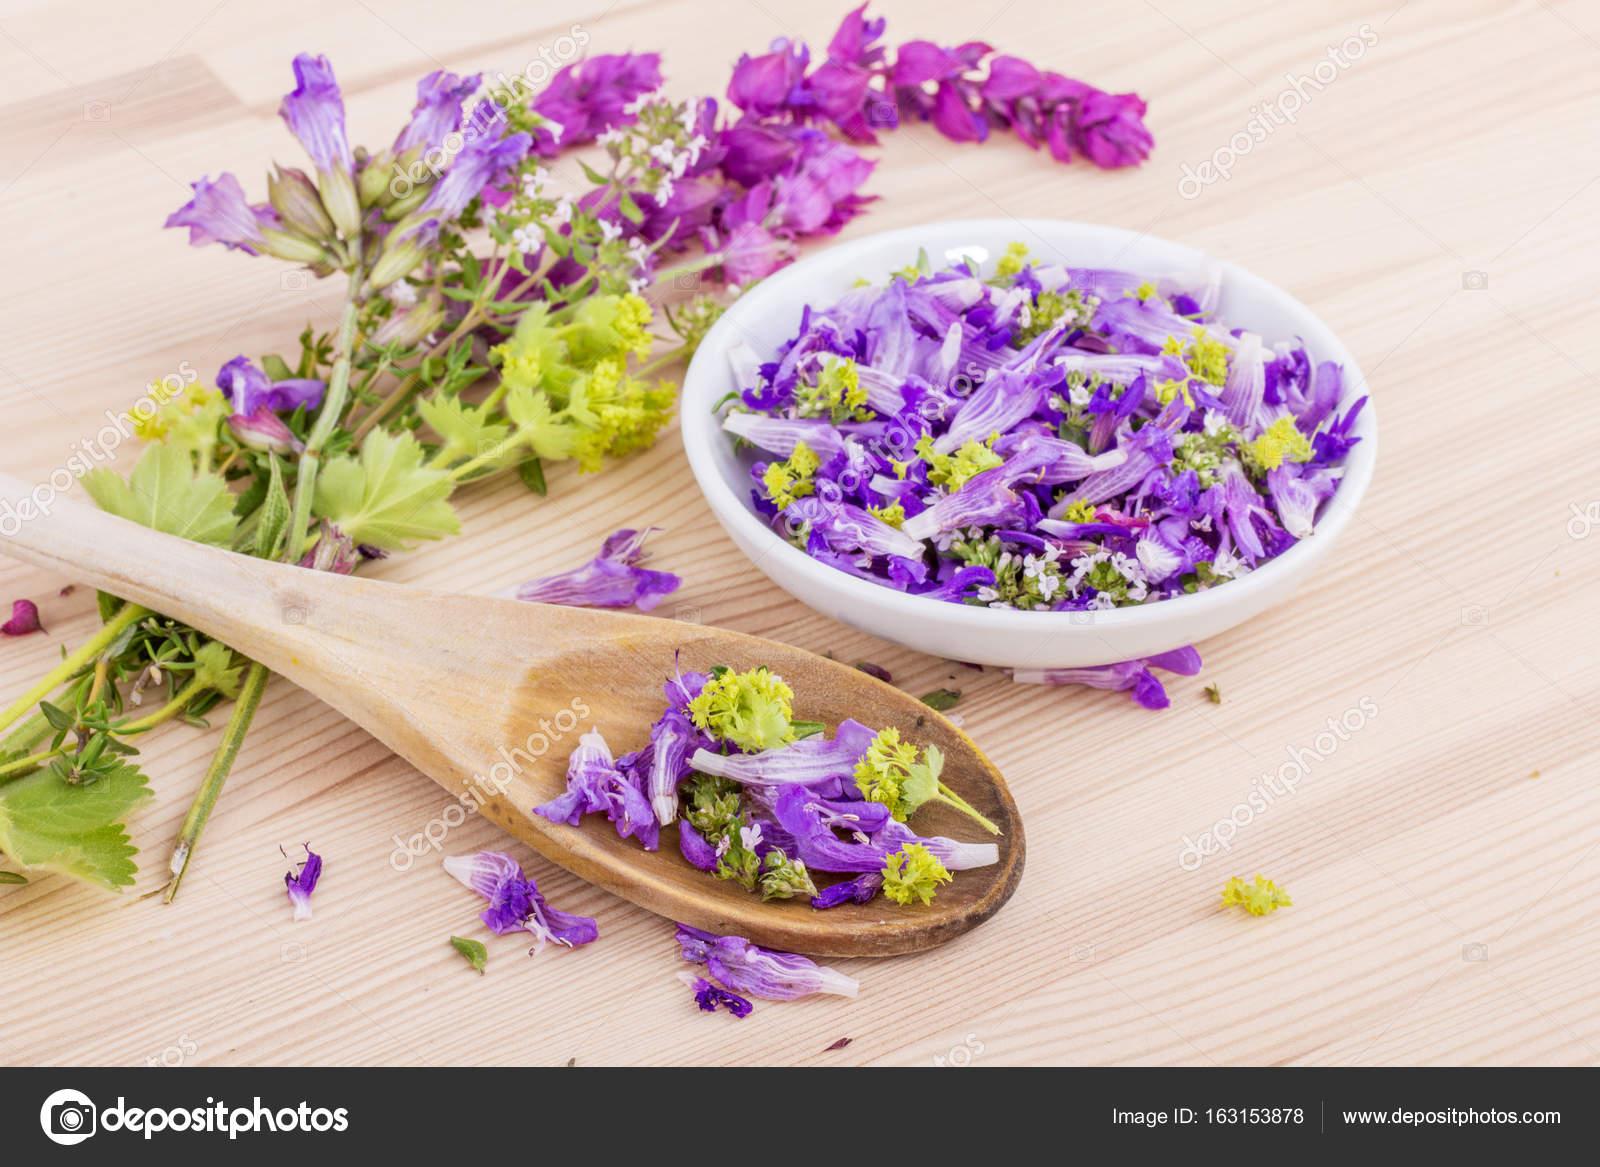 Violet Edible Flowers Stock Photo C Coramueller 163153878